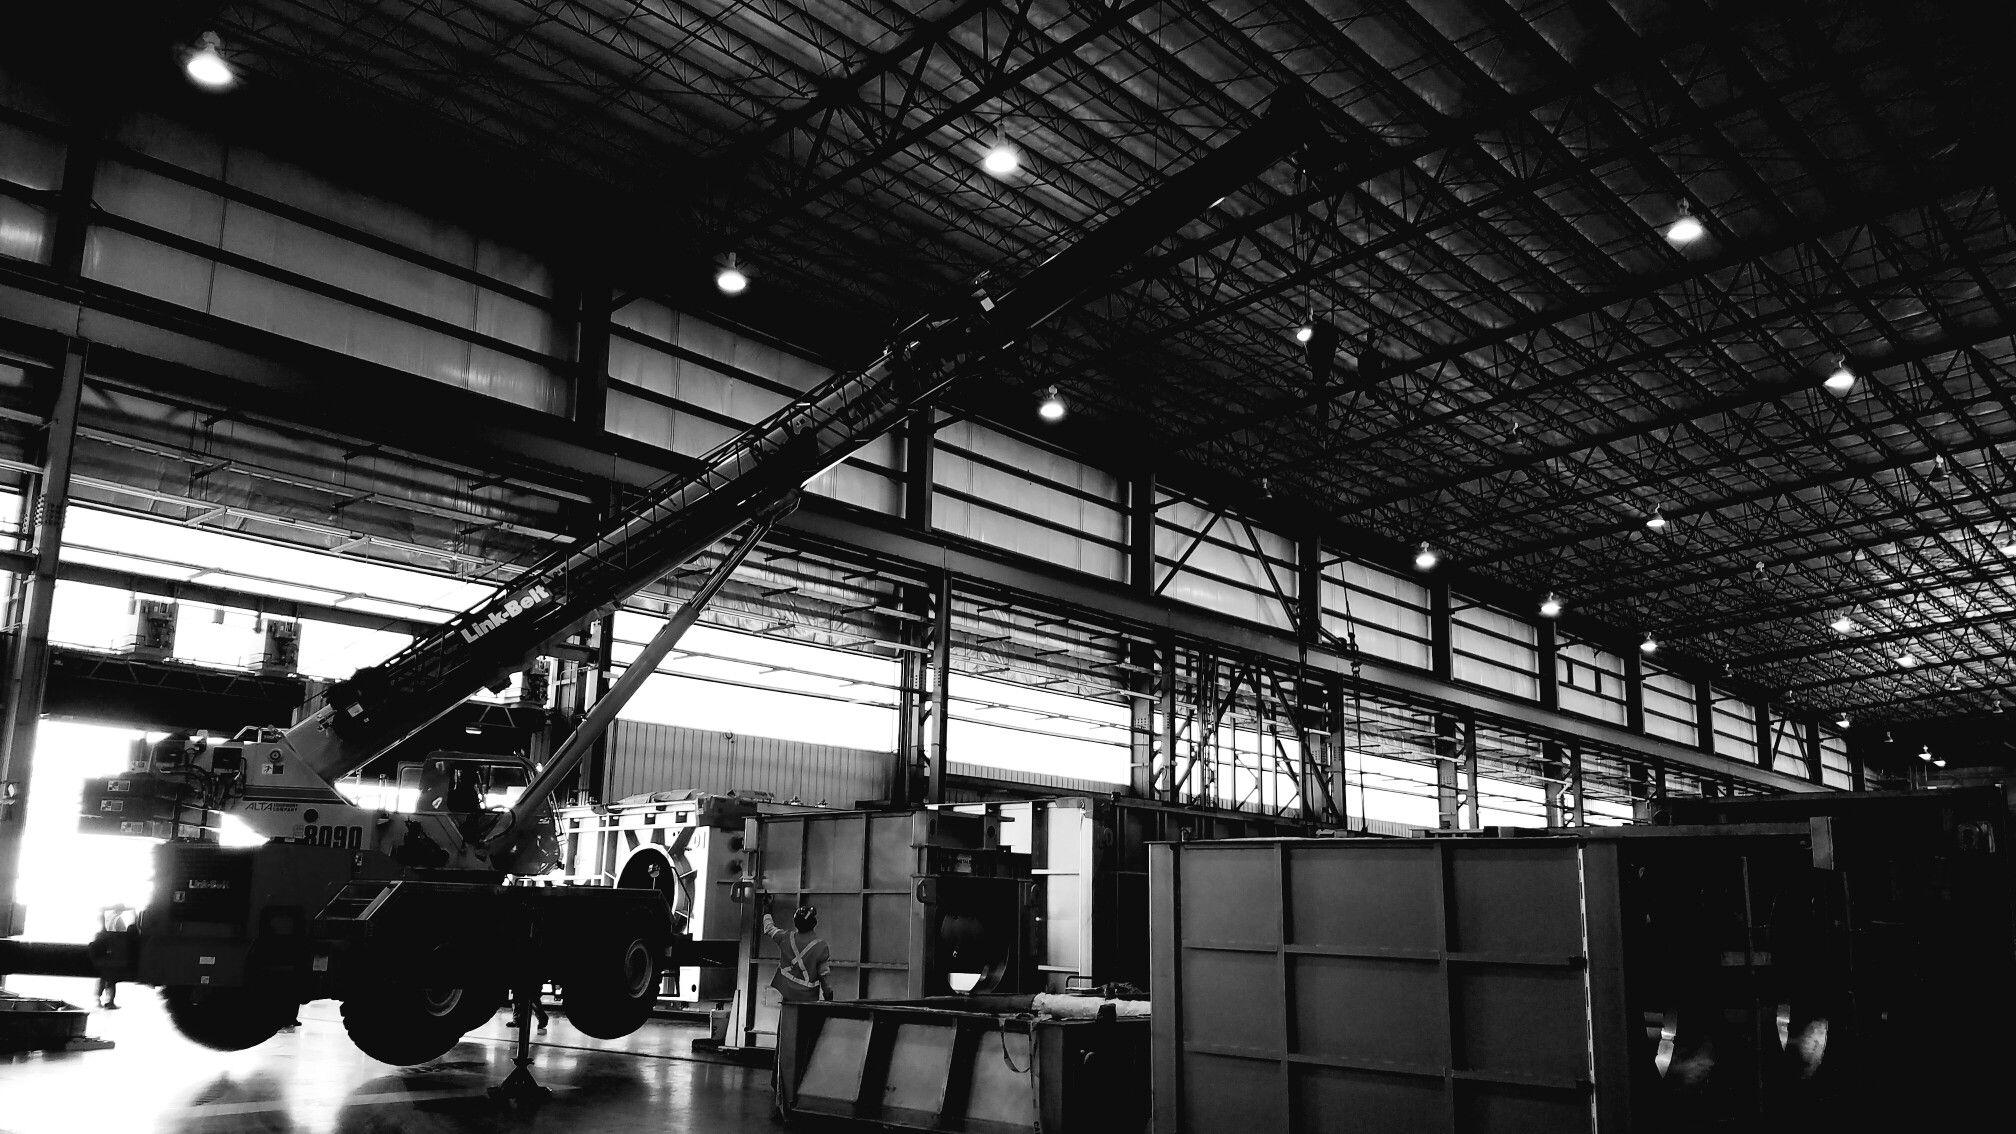 Steel mill upgrade 8090 crane